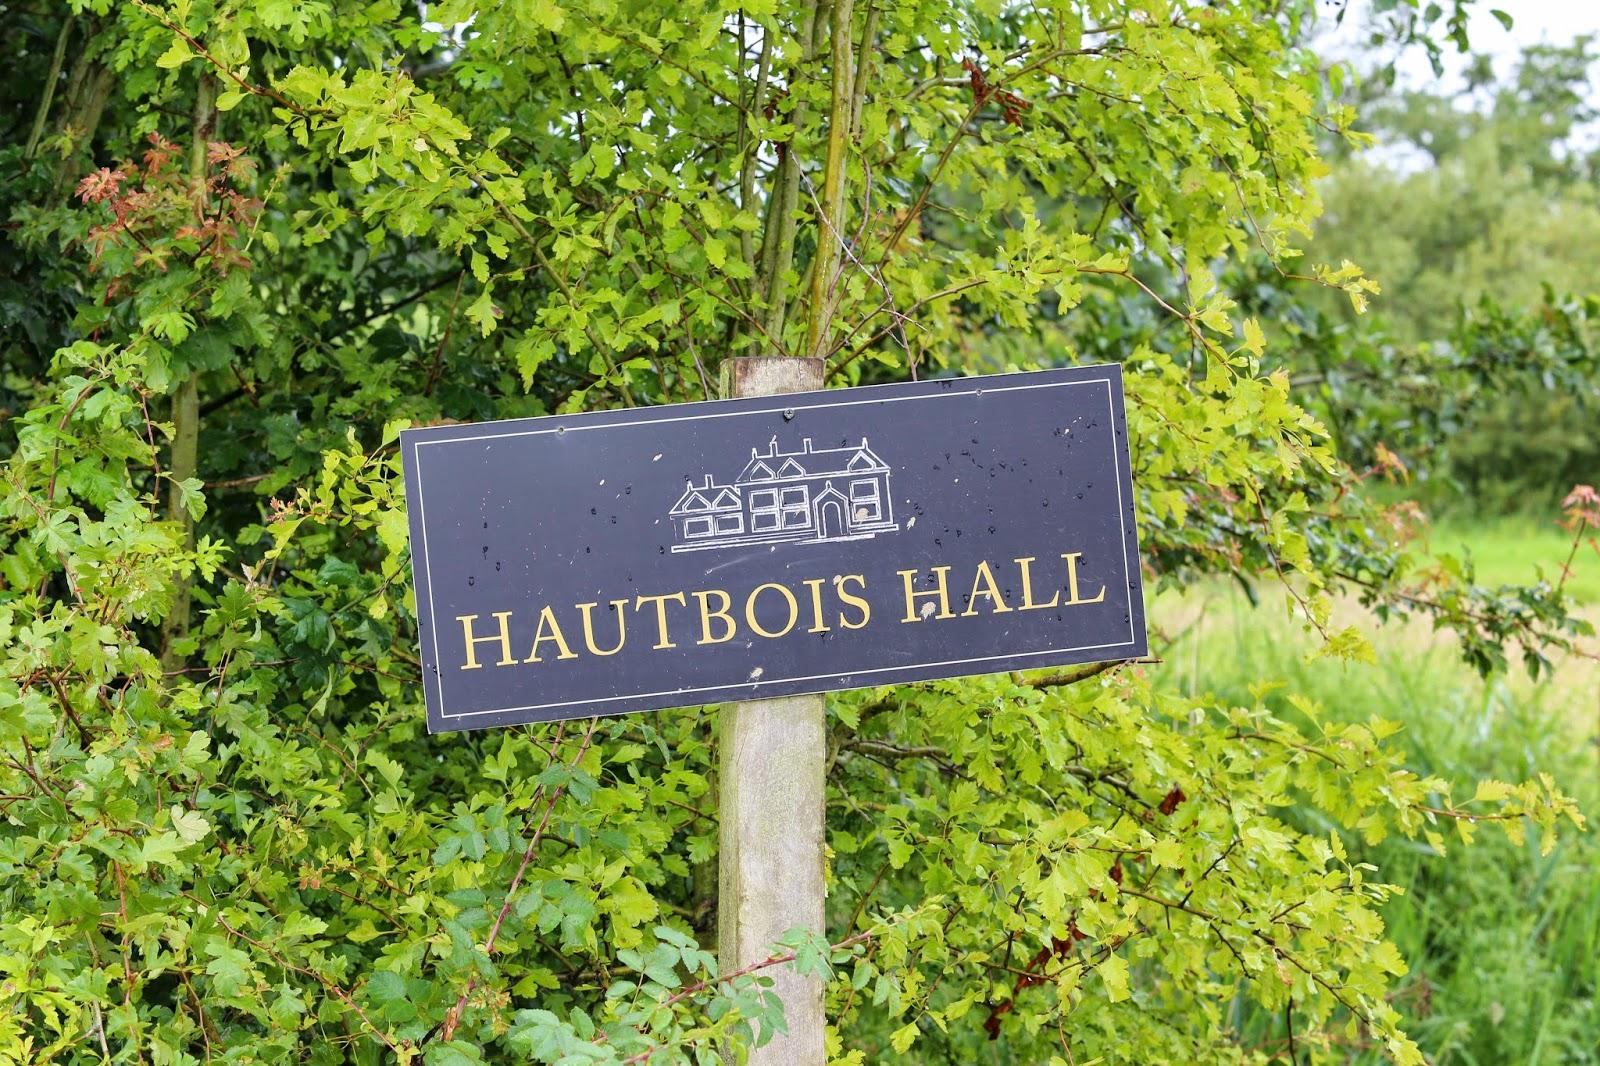 Dazed Photography Hautbois Hall The Perfect Location